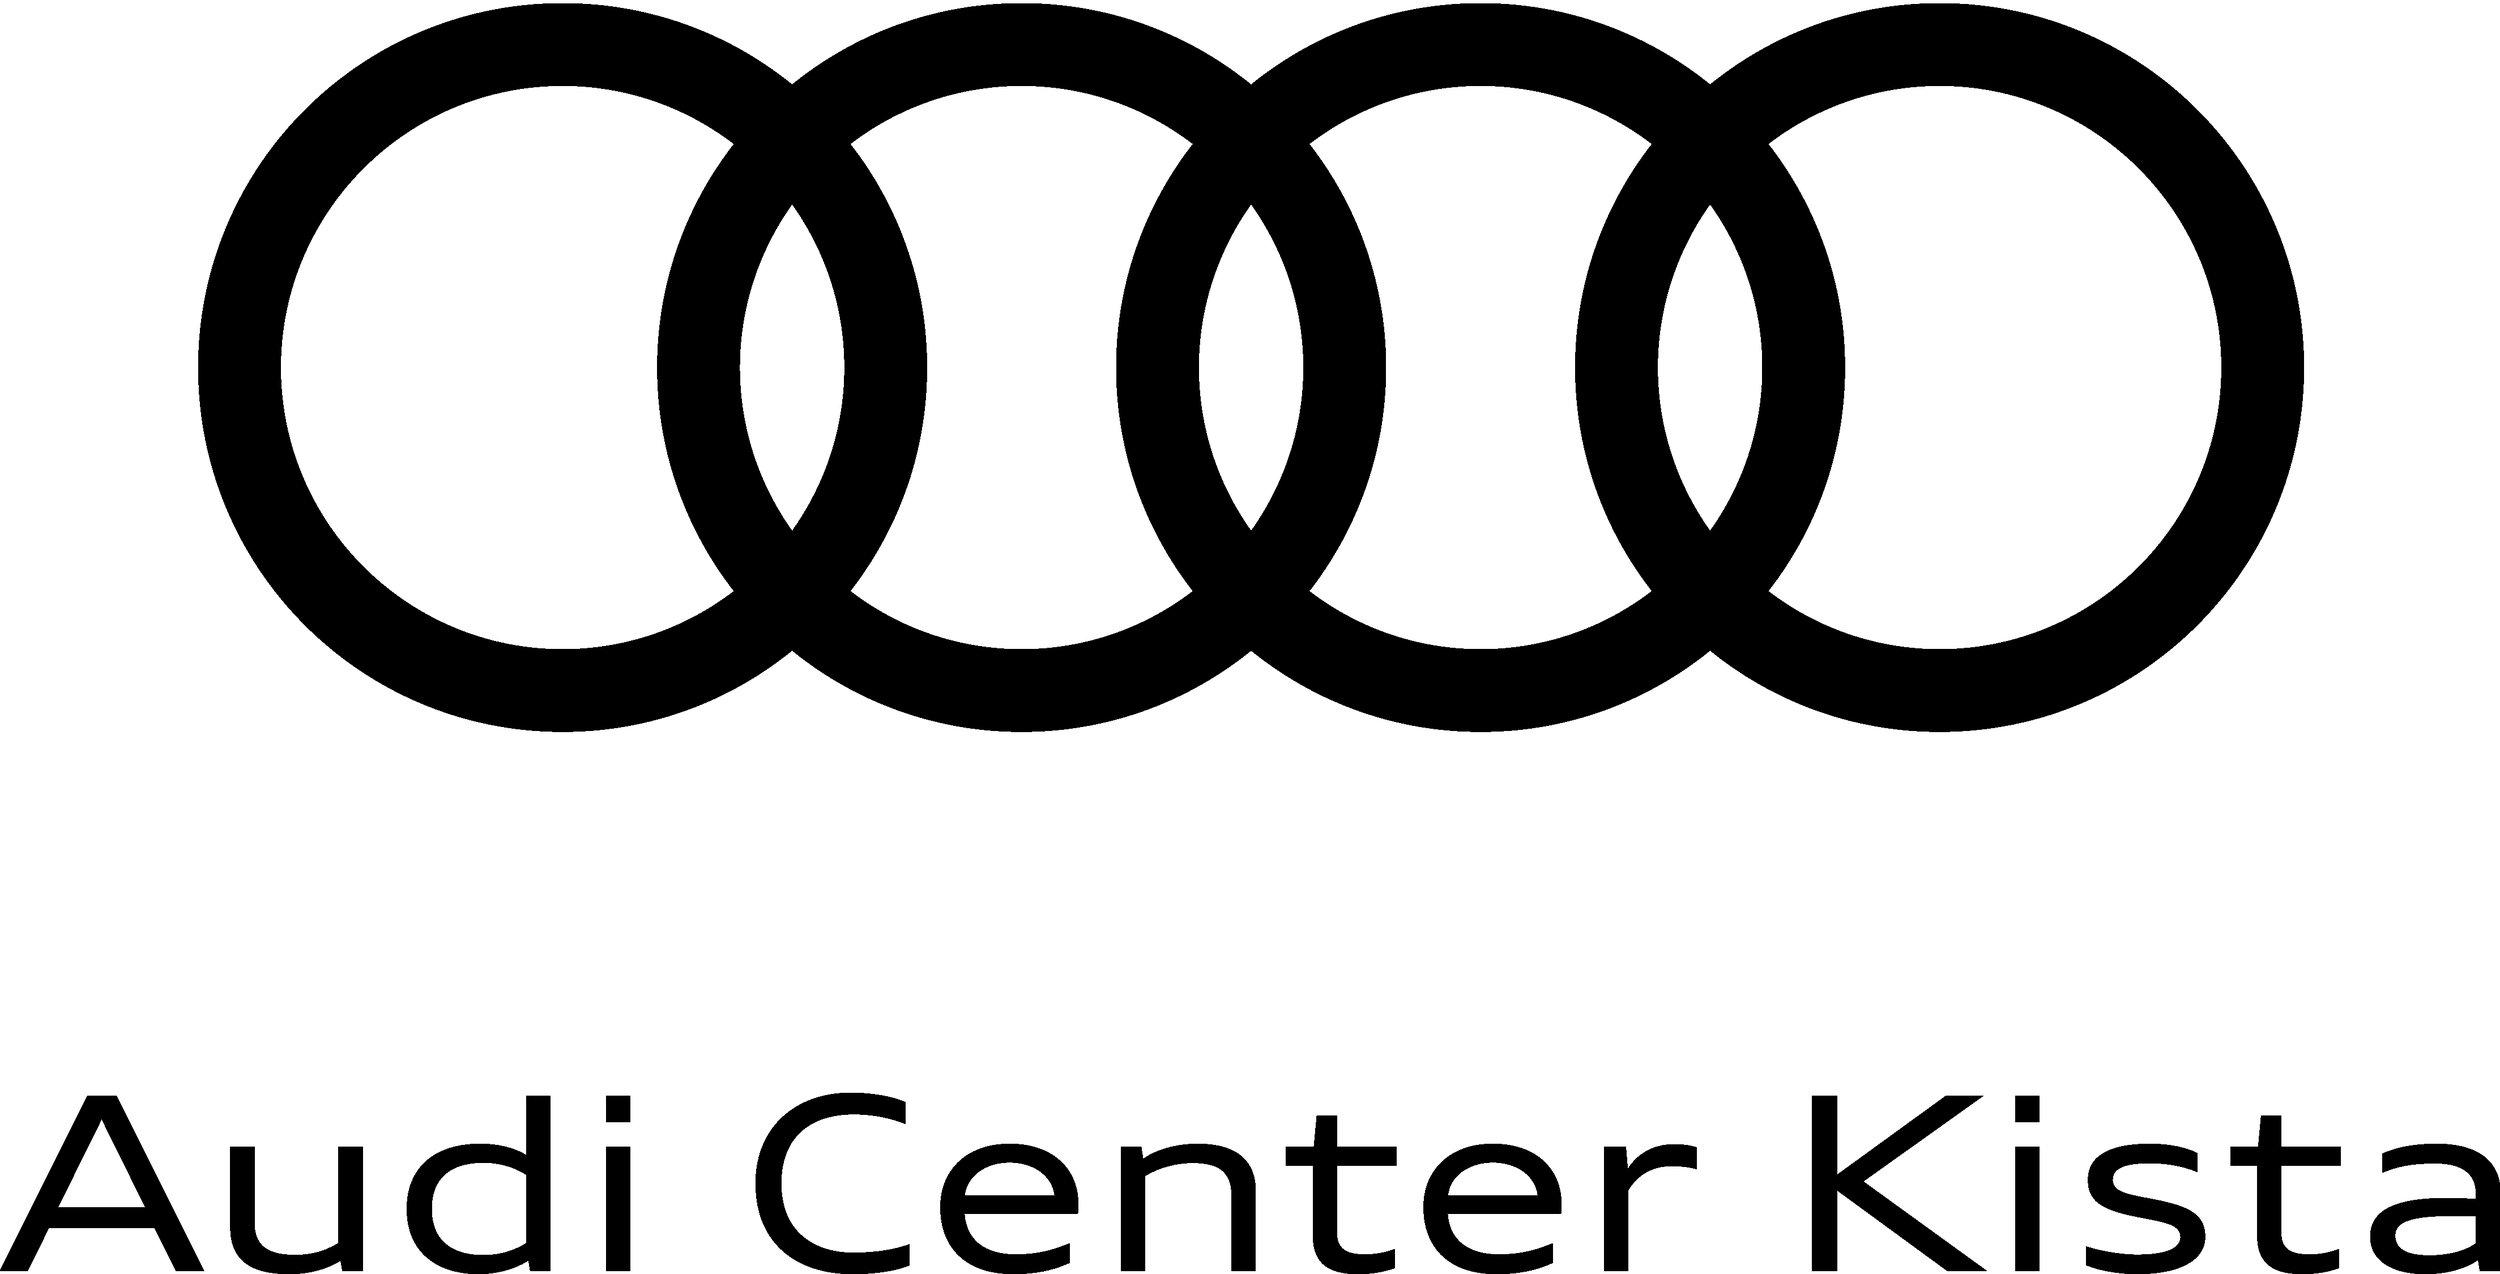 Audi_Center_Kista_logo.jpg